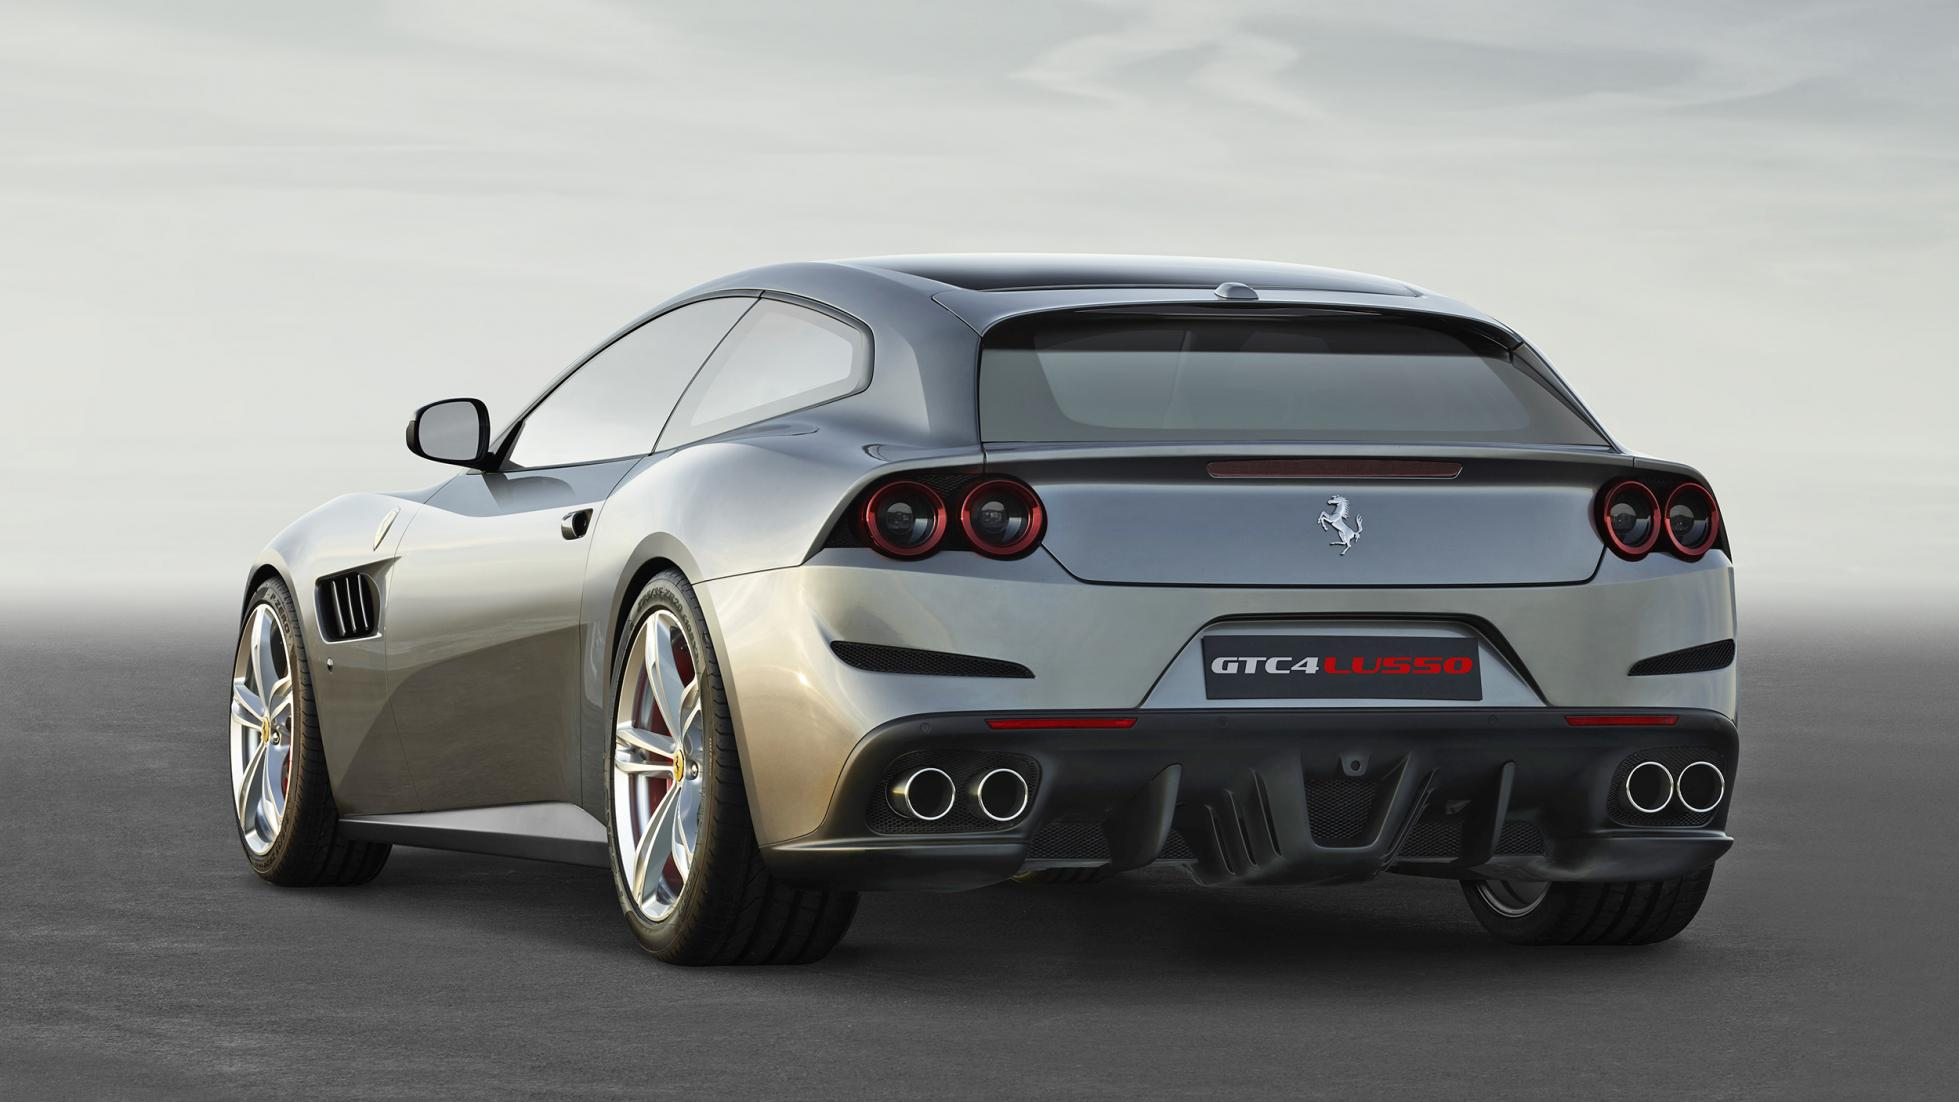 tuscany gtb en rental service rome vip luxury cars rent ferrari img